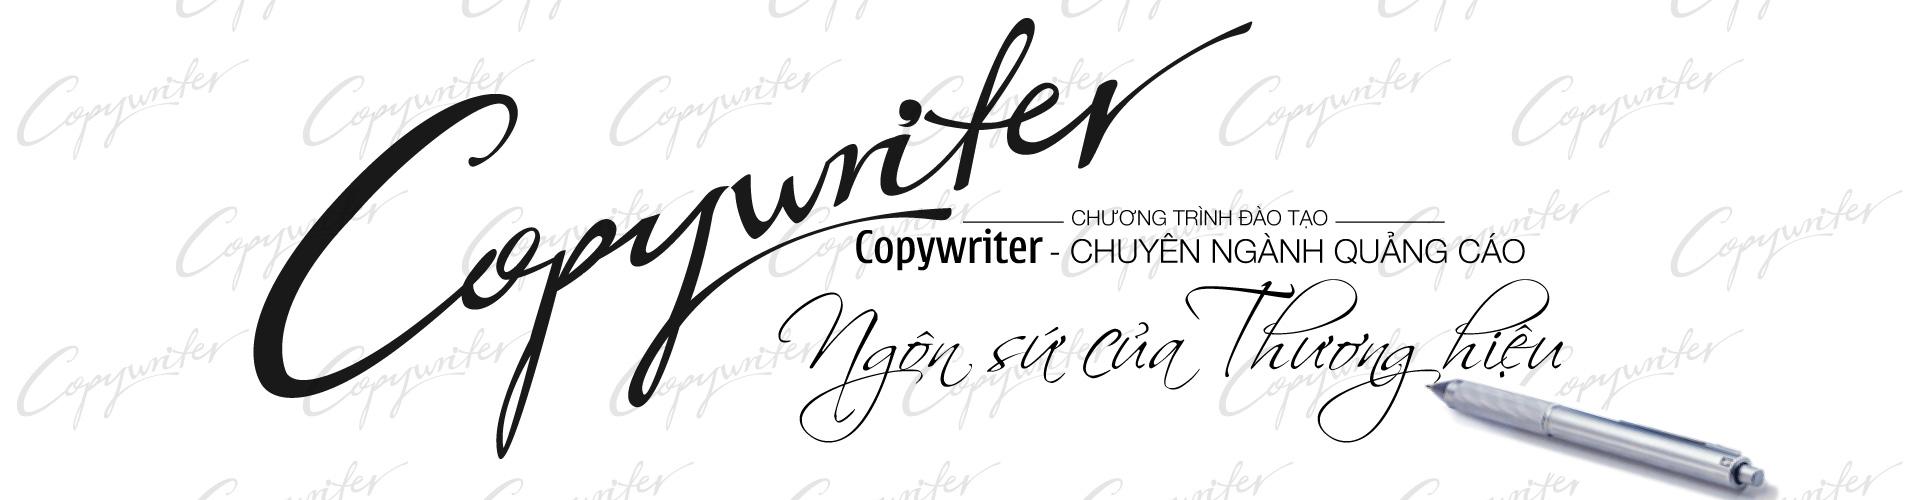 copywriter vietnammarcom